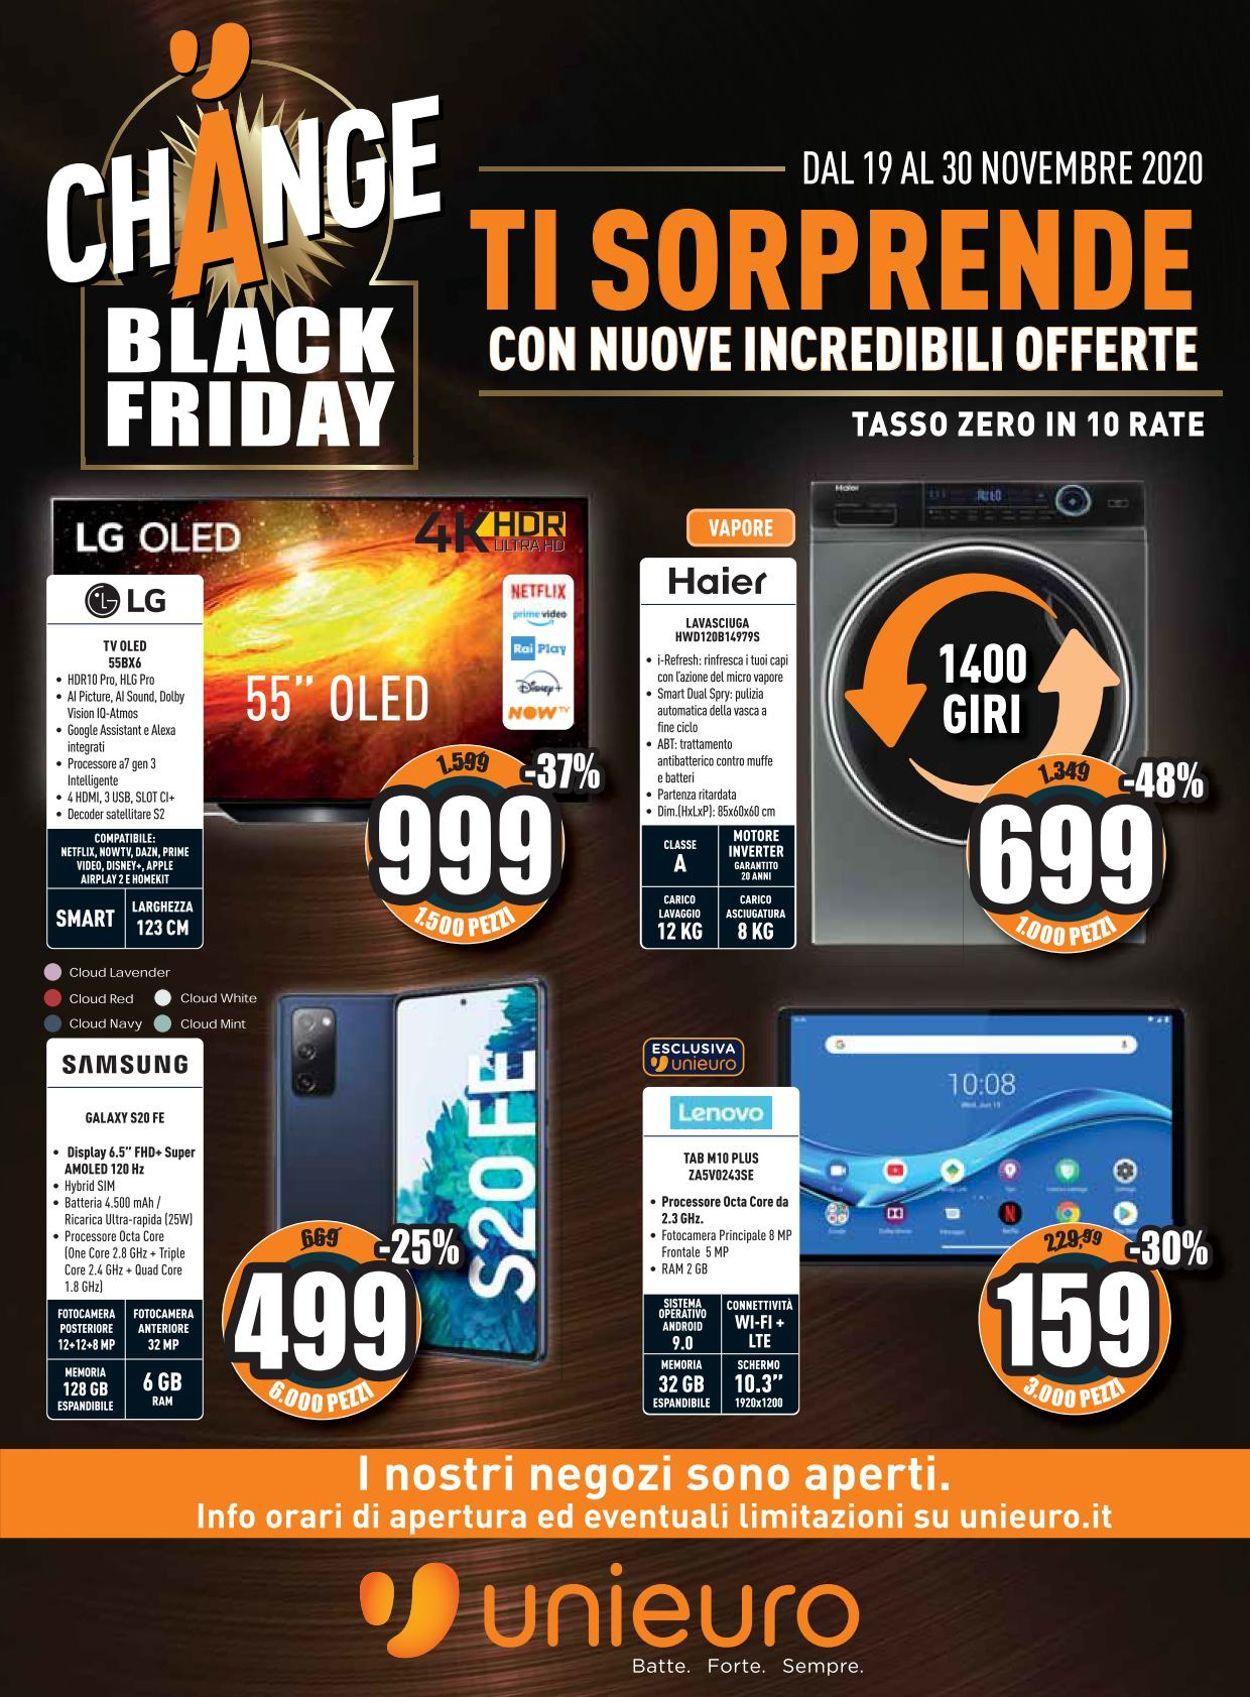 Volantino Unieuro - Black Friday 2020 - Offerte 19/11-30/11/2020